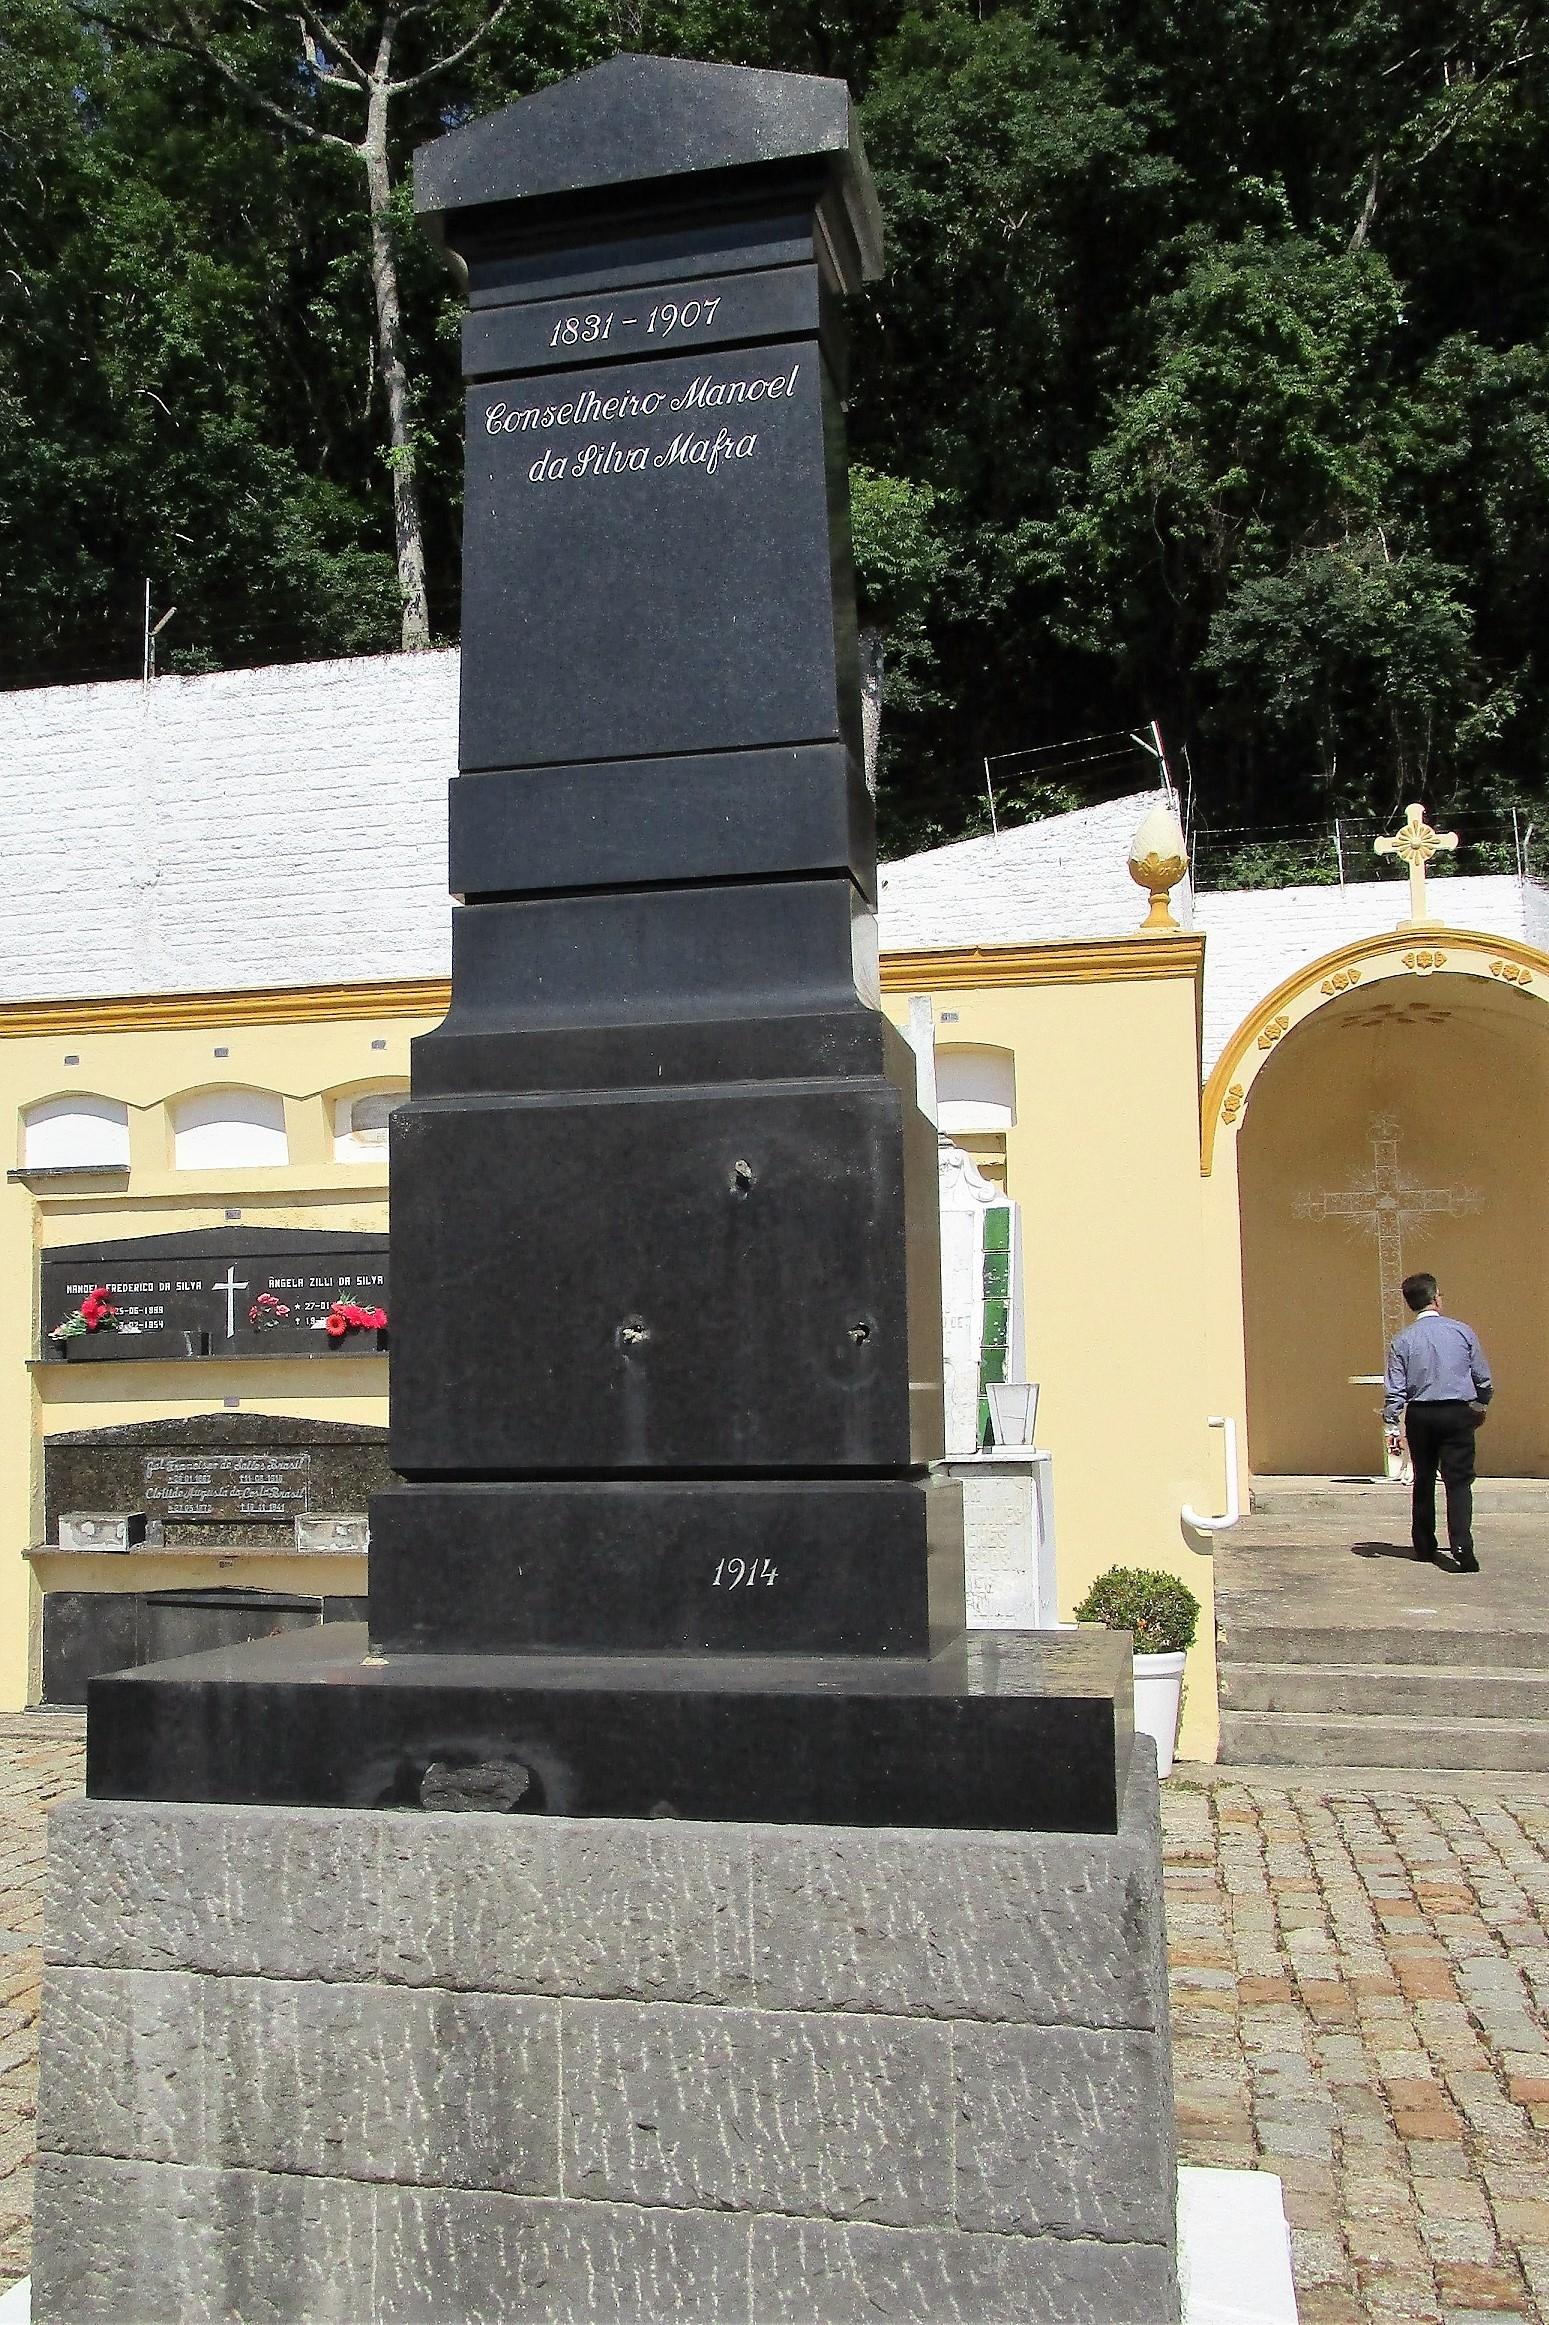 Túmulo de Manoel da Silva Mafra, o Conselheiro Mafra, de 1914 - Carlos Damião